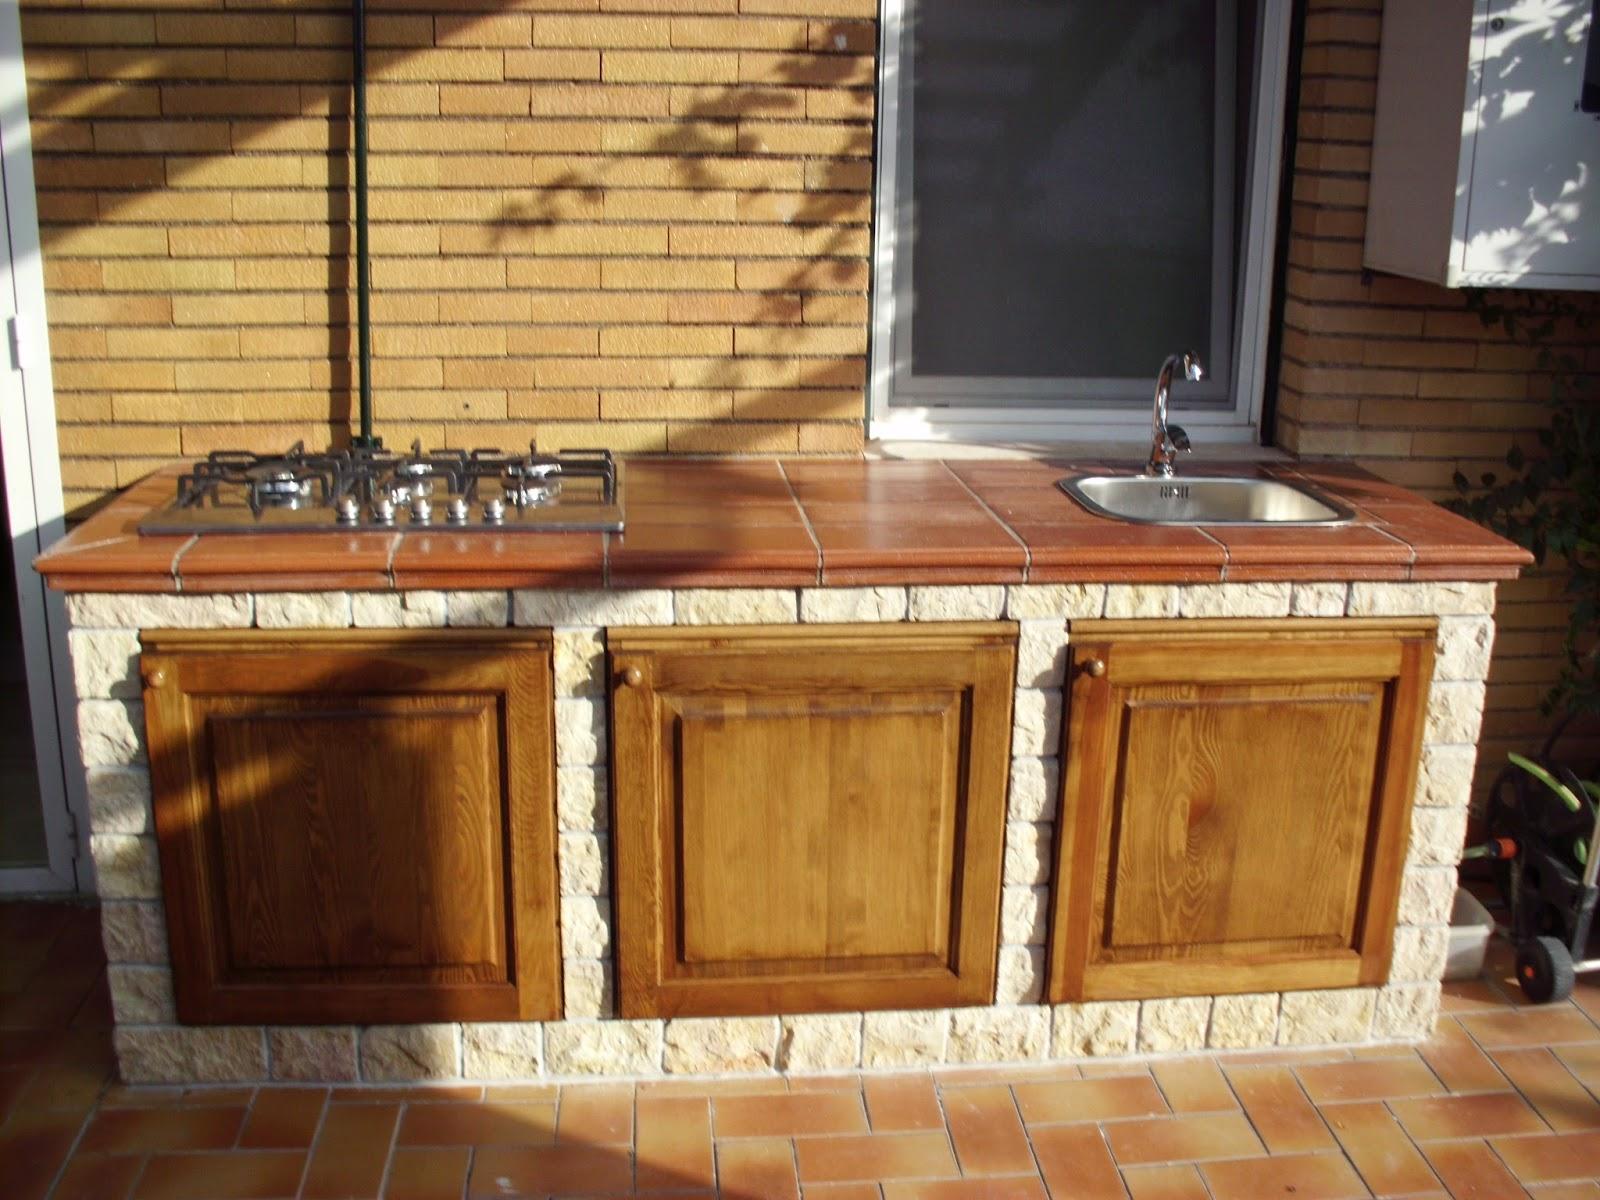 Cucina In Muratura Per Esterni | Cucine Esterne In Muratura Con ...